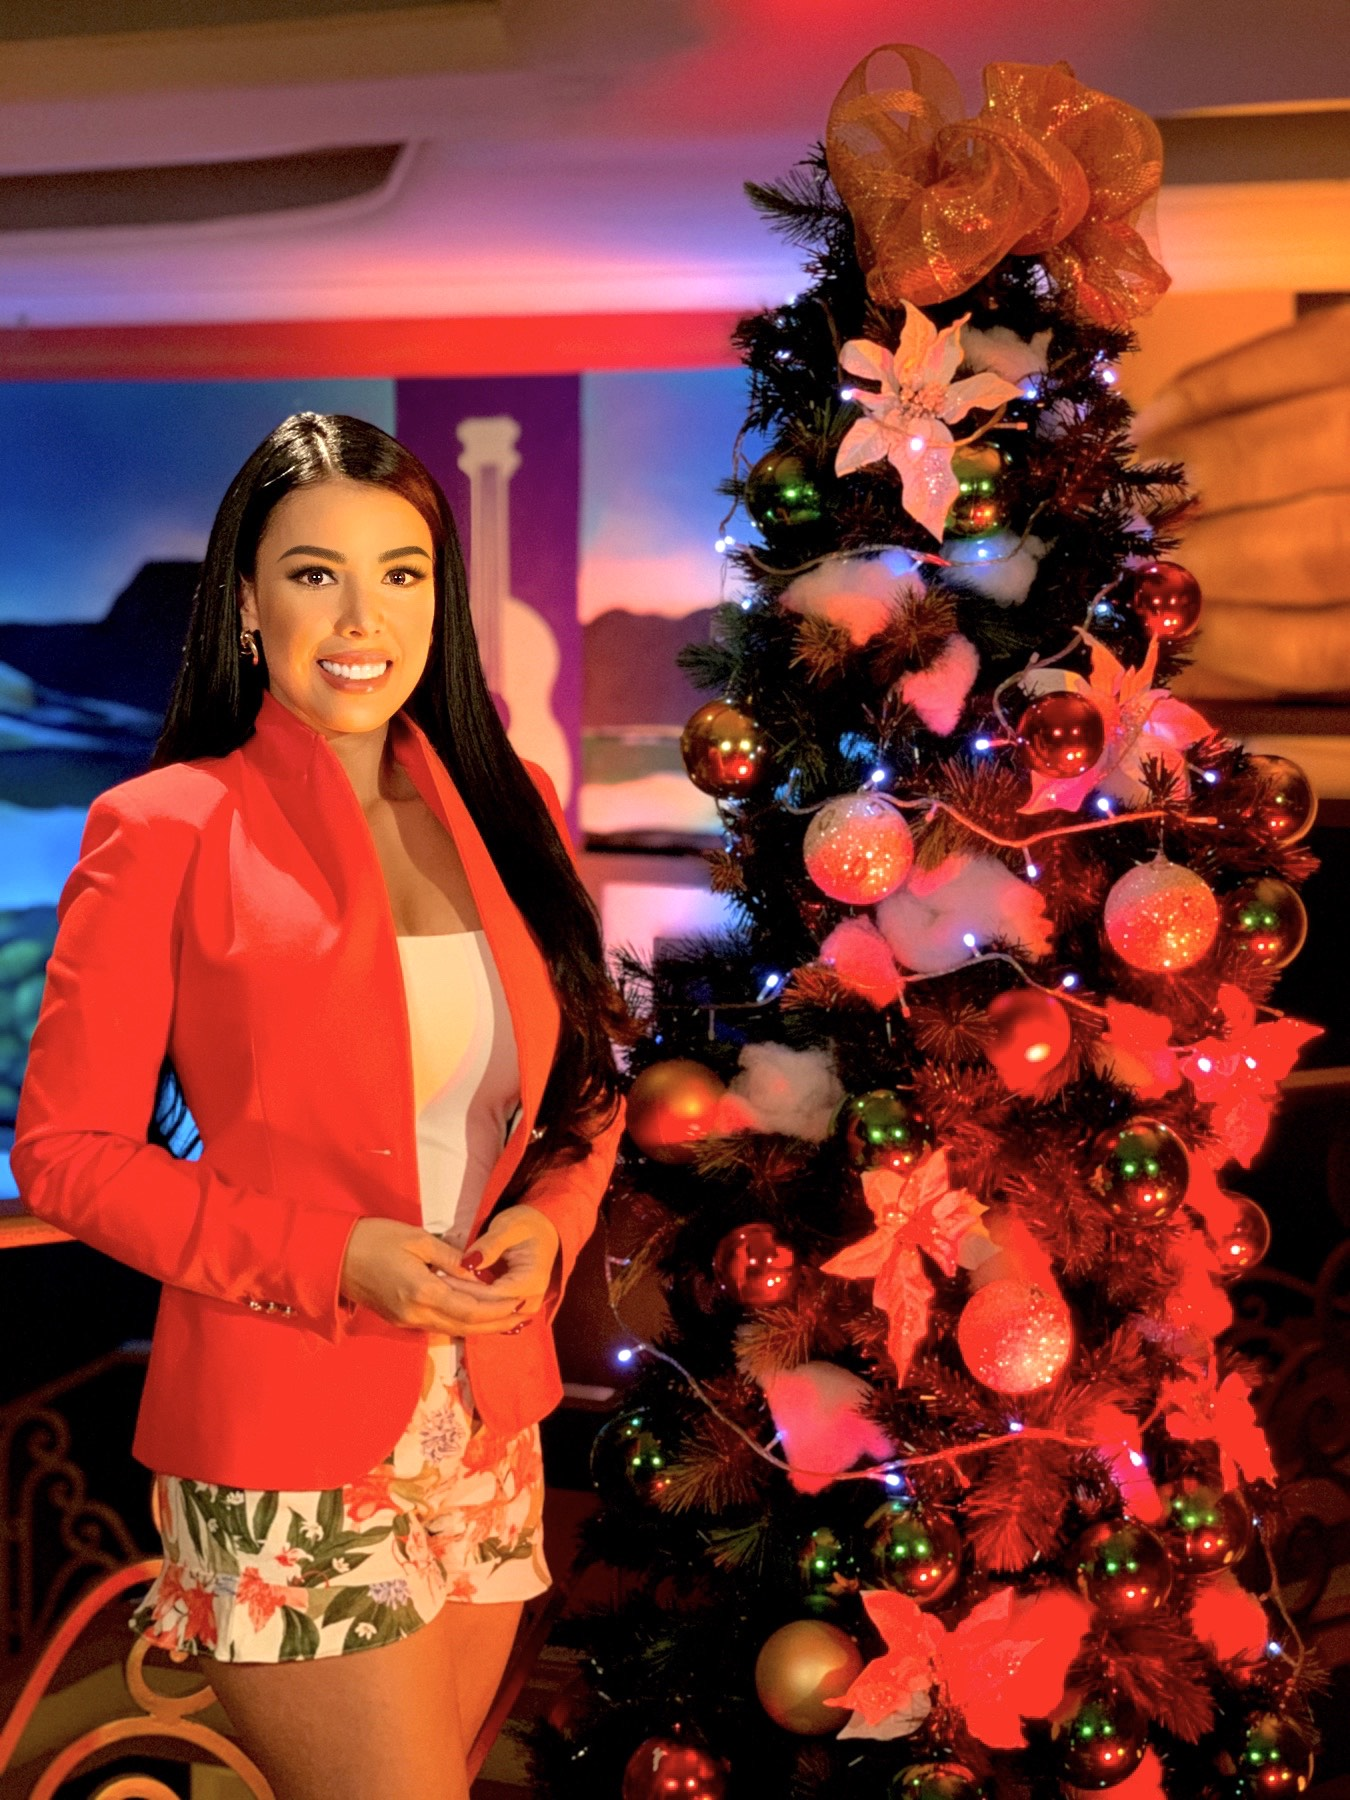 Patricia Peña - Patricia Peña